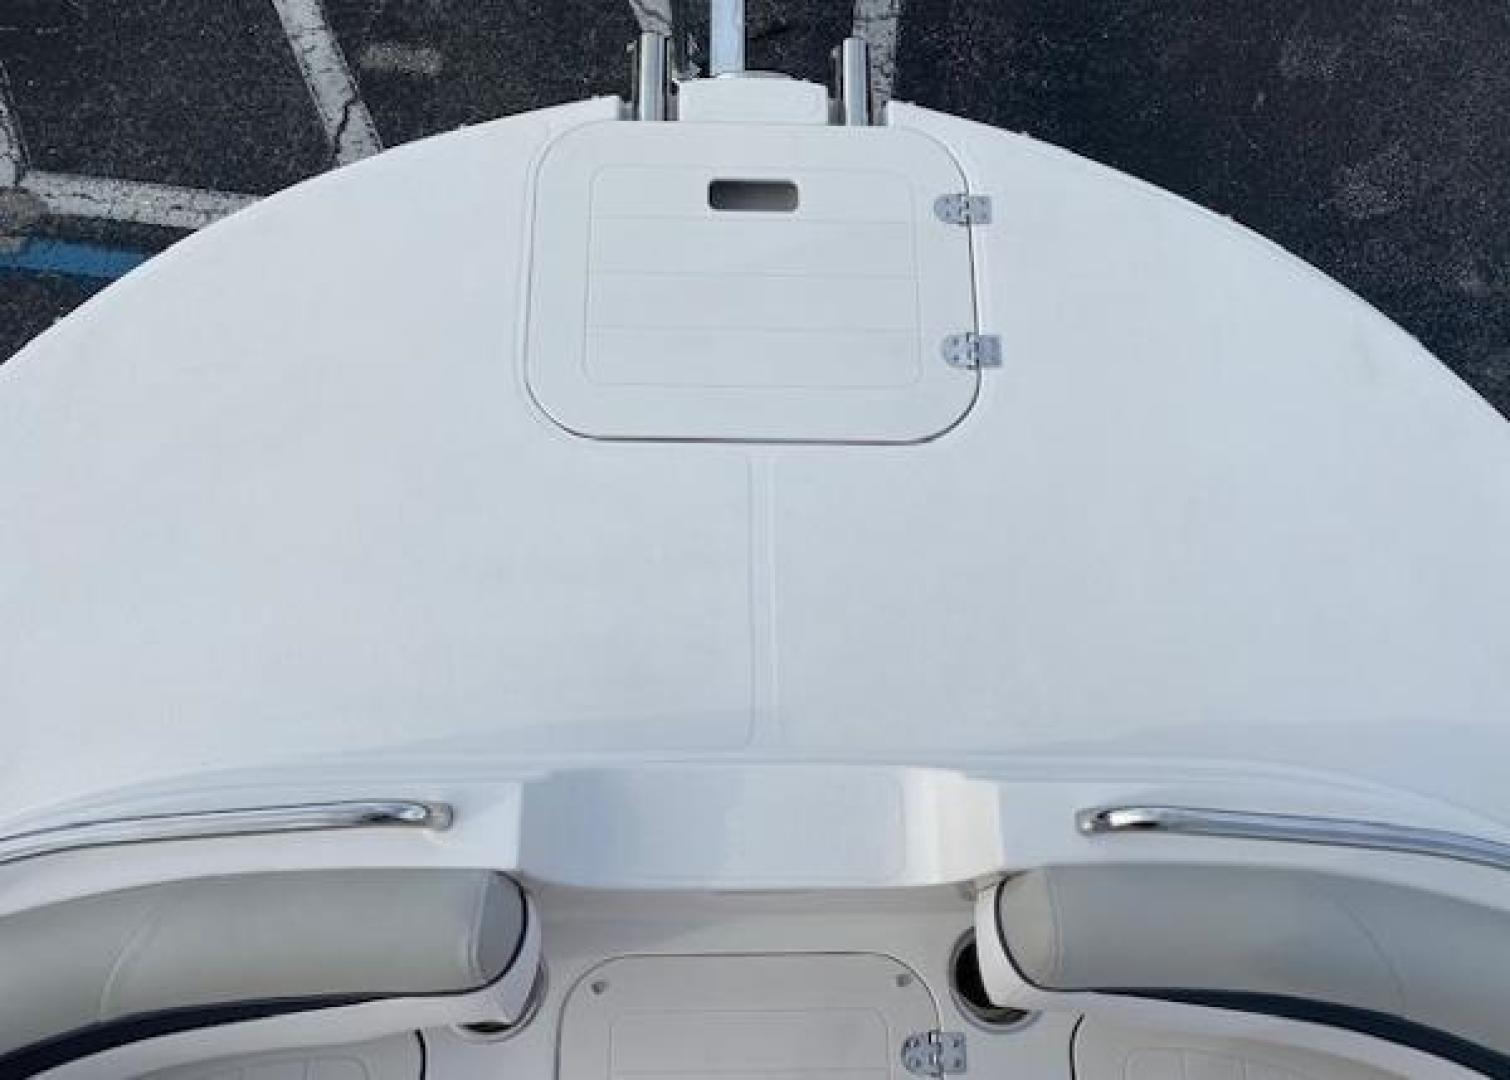 Starcraft-MDX 211 CC 2021-Starcraft MDX 211 CC Tampa Bay-Florida-United States-1532995 | Thumbnail